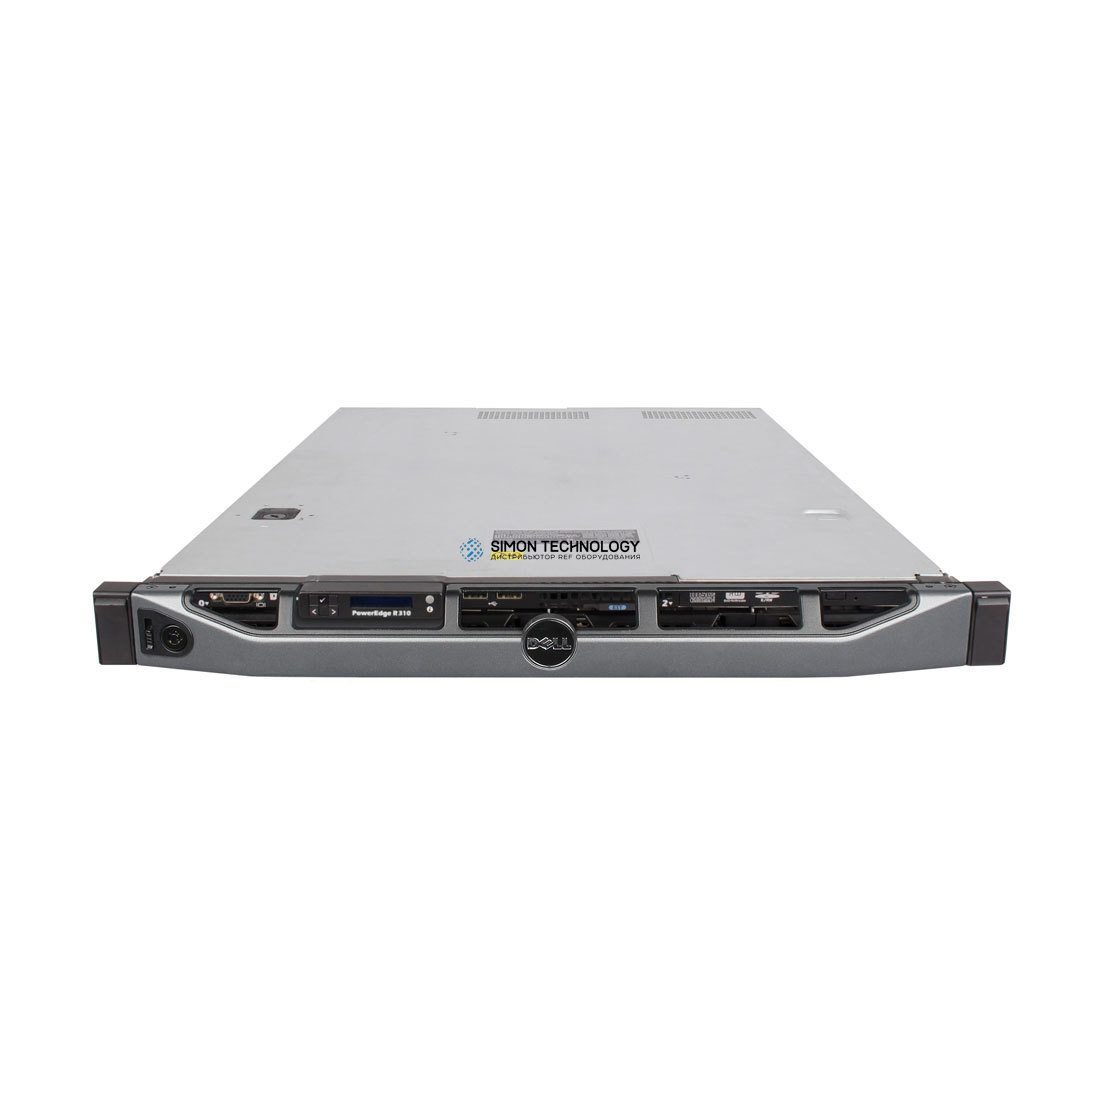 Сервер Dell PER310 1* X3440 2GB PERC 6I 4*LFF 1*PSU DVD (R310 X3440 2GB)